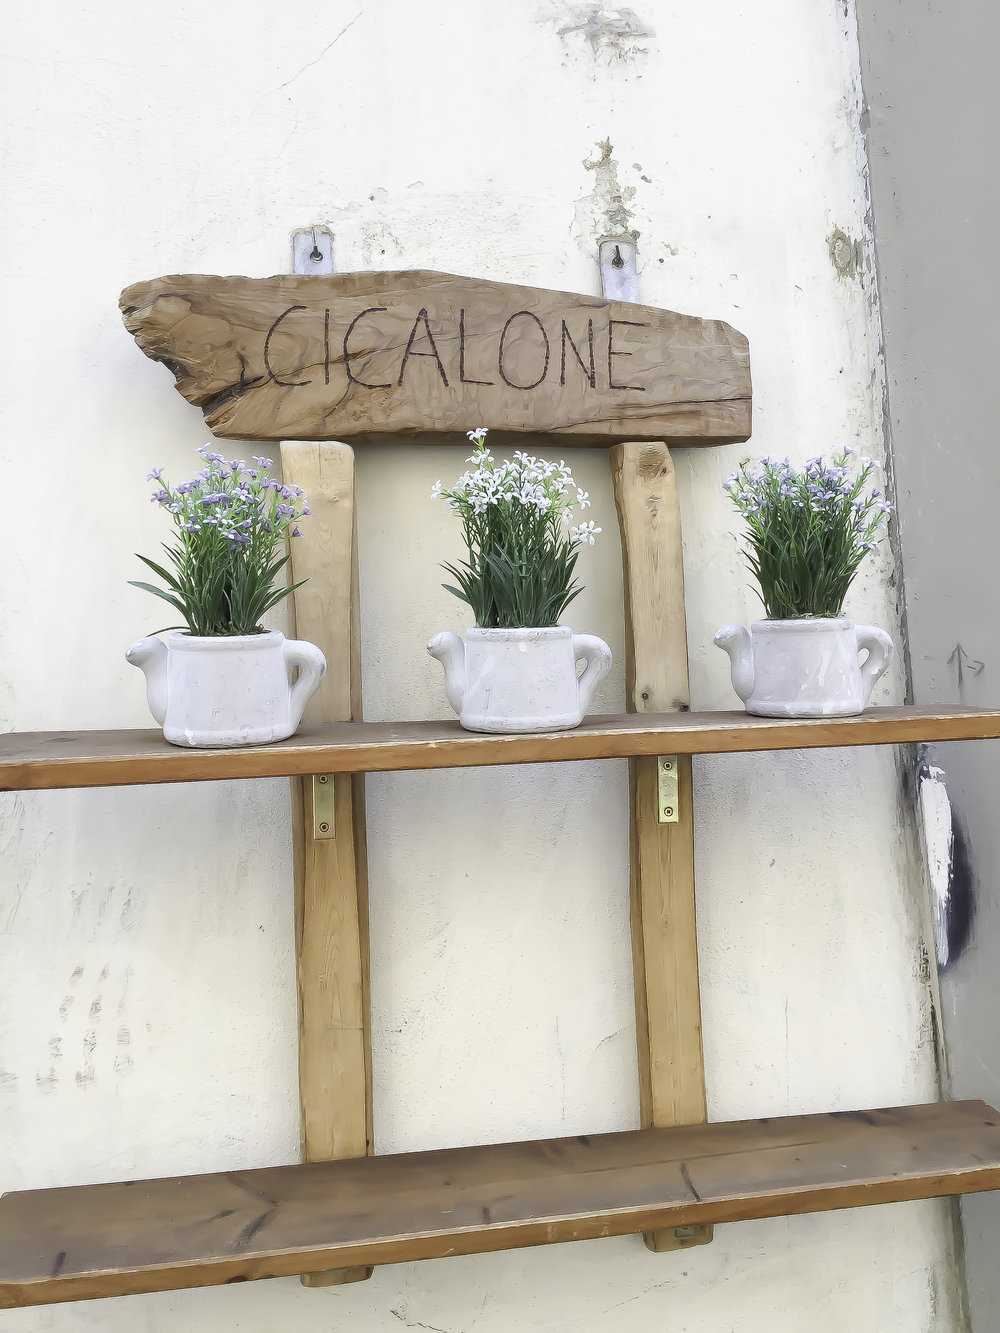 Decor at Vinaino Cicalone on Via Delle Belle Donne